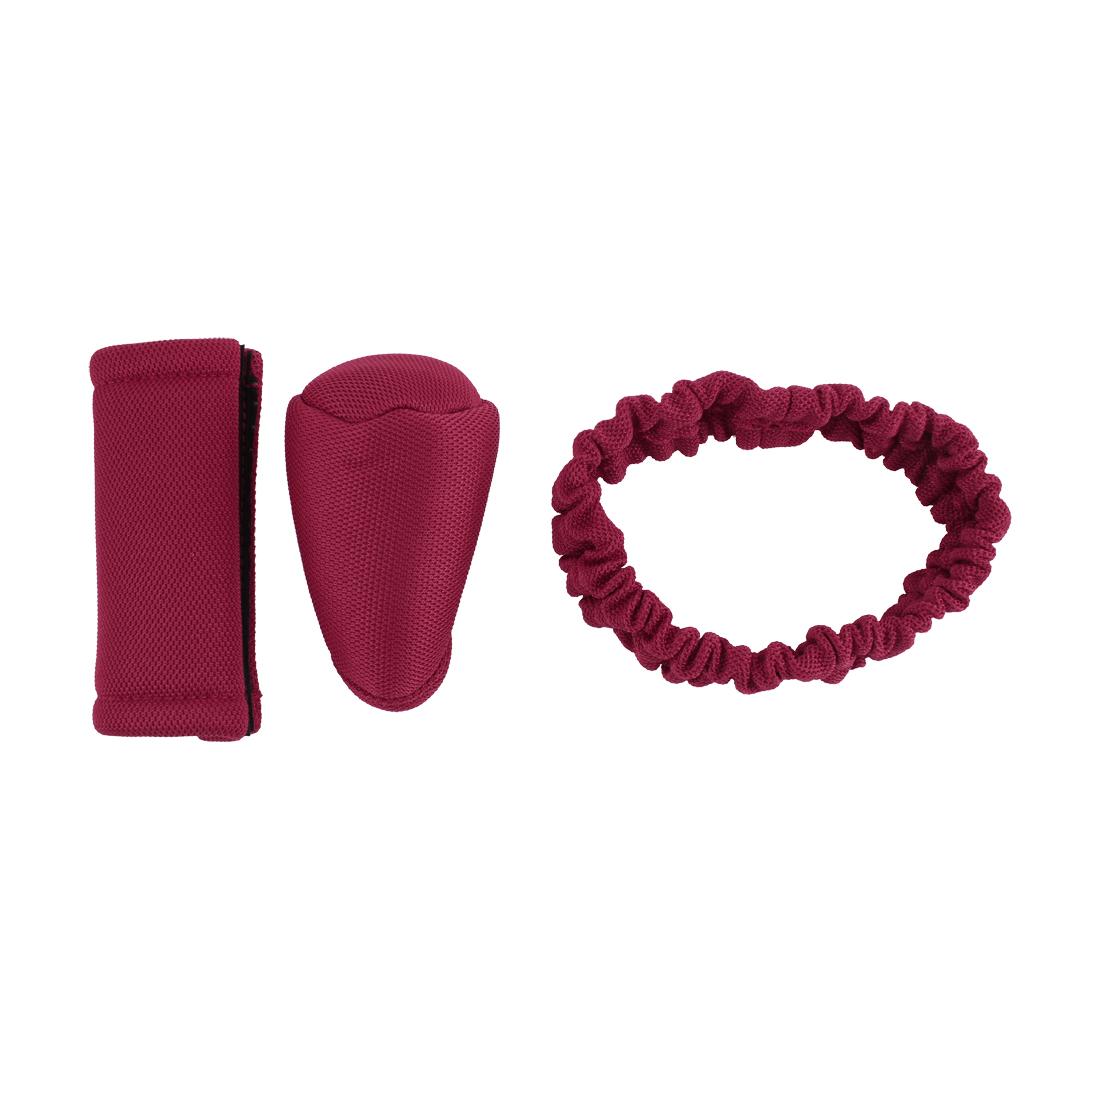 3 in 1 Car Hook Loop Closure Gear Knob Hand Brake Handbrake Mirror Cover Red Sets